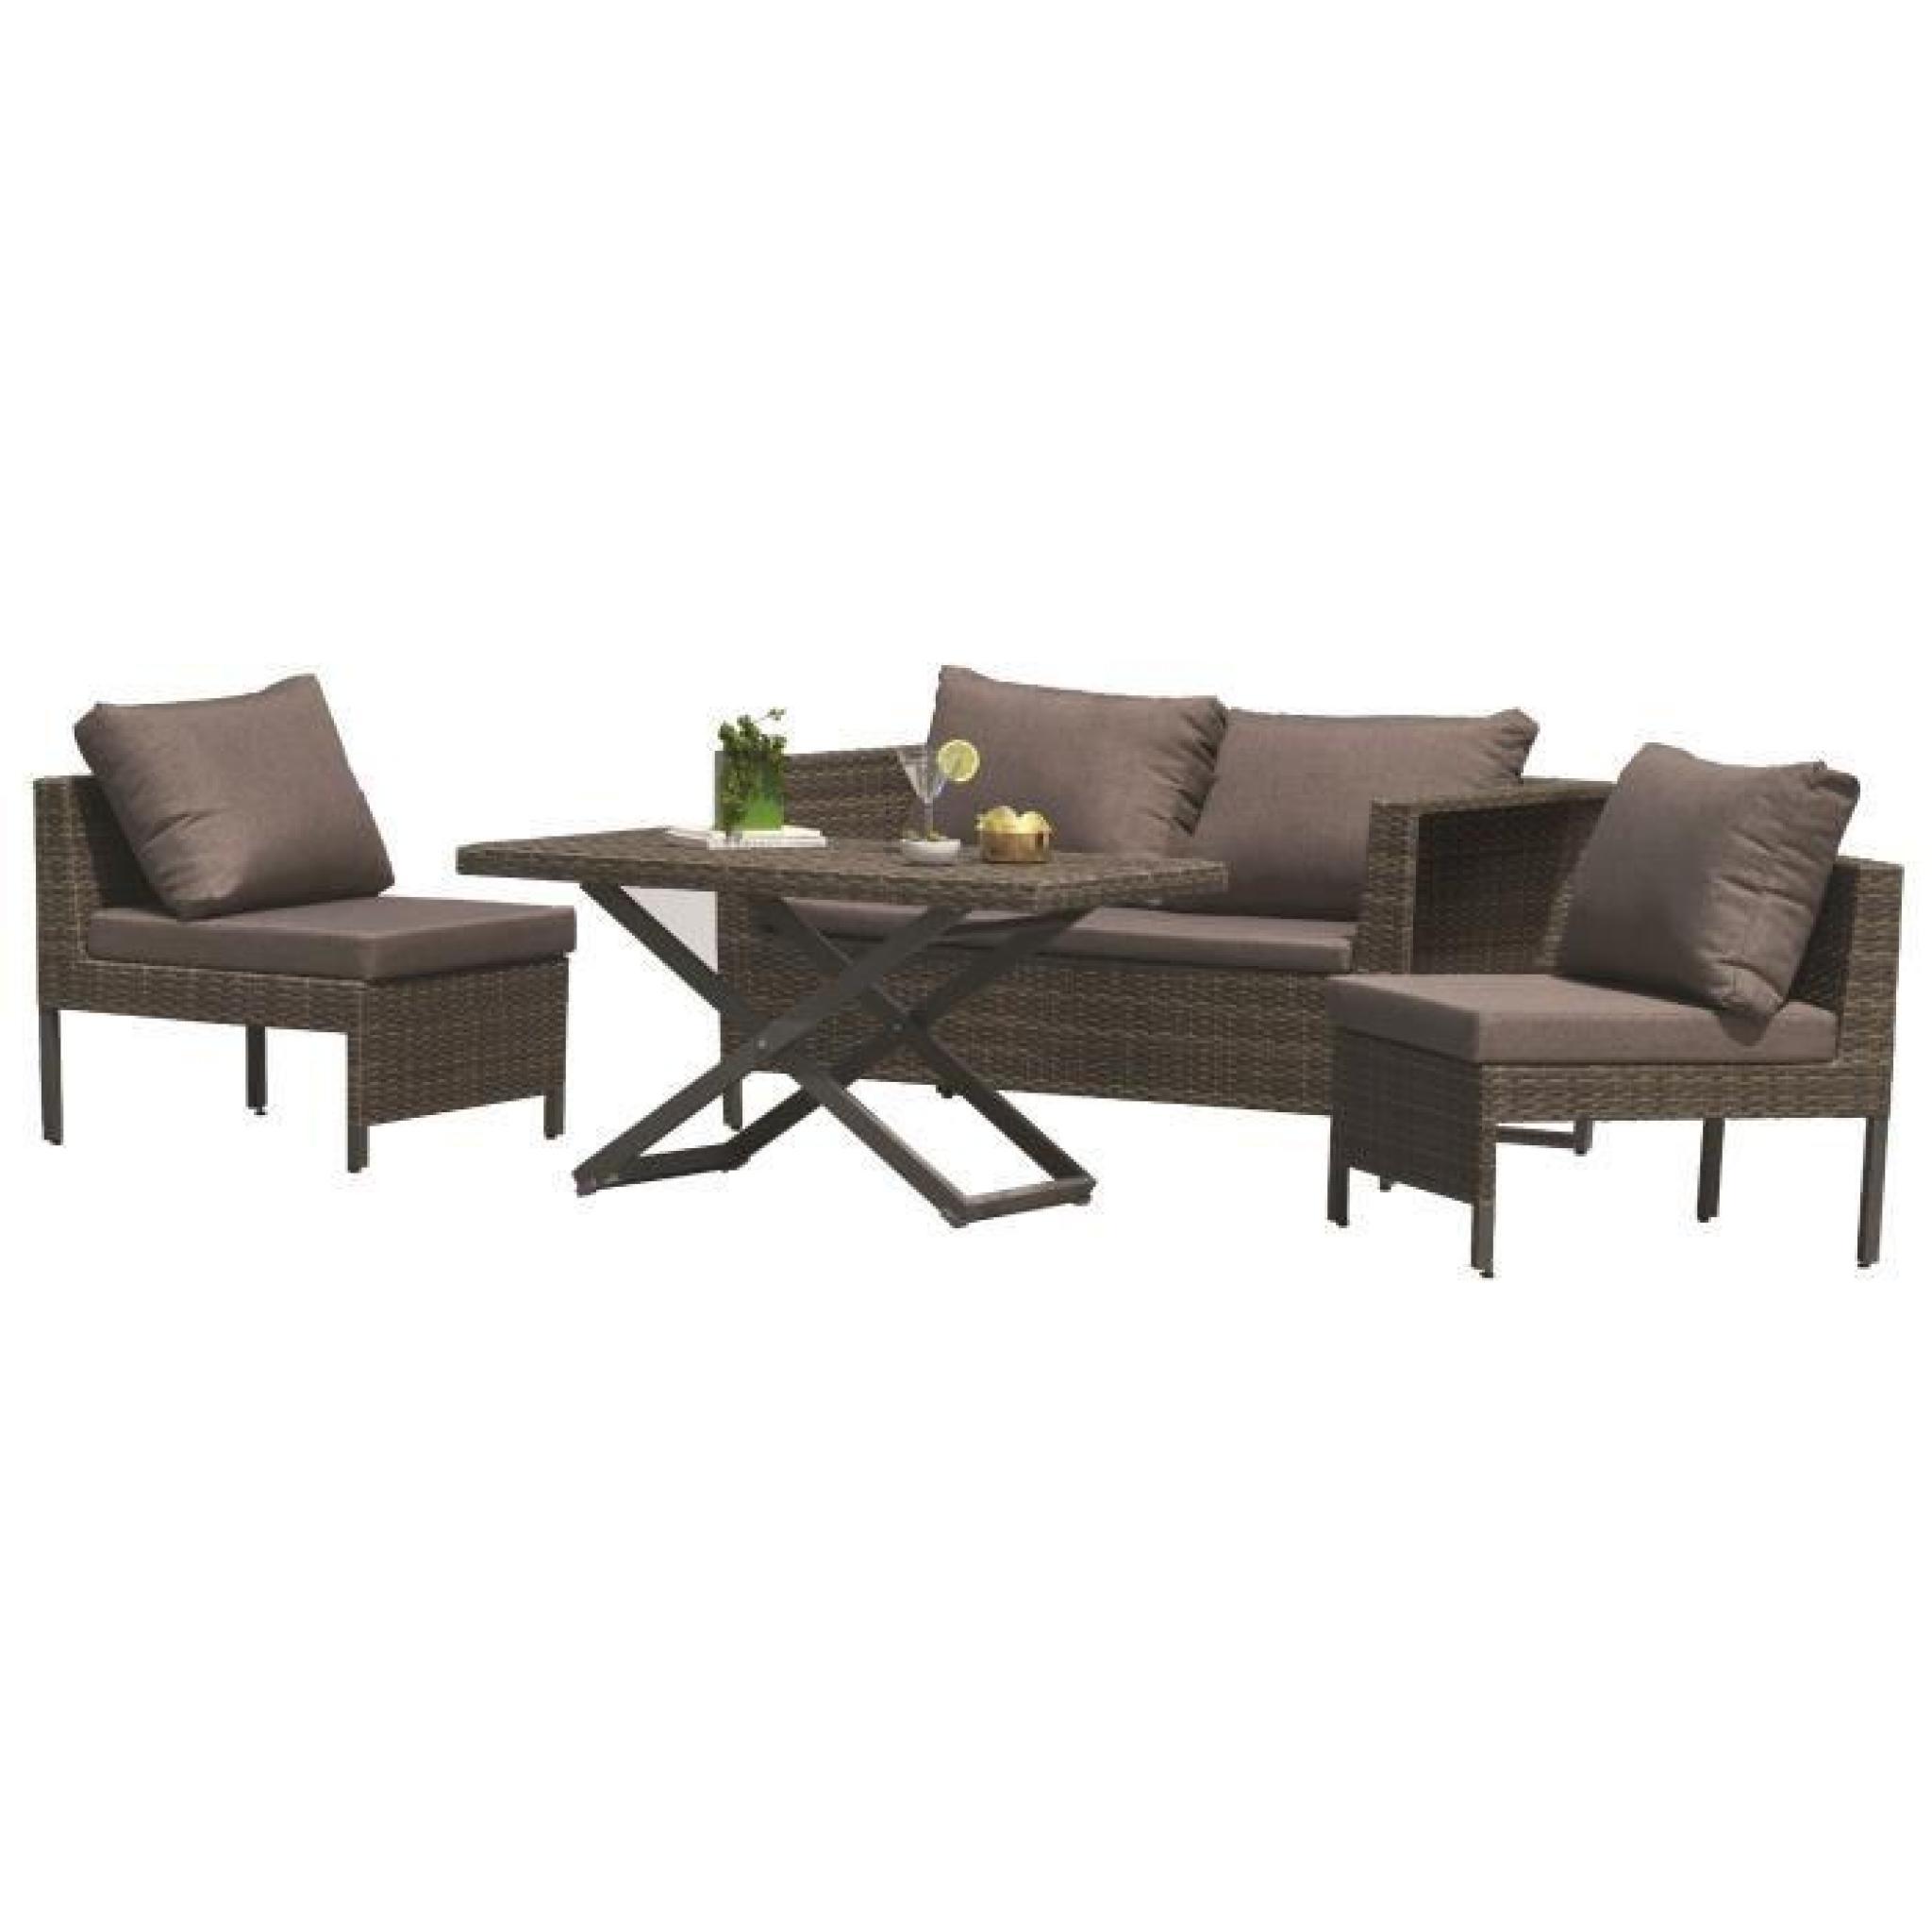 dcb garden salon de jardin modulo 1 table basse 1 canap. Black Bedroom Furniture Sets. Home Design Ideas